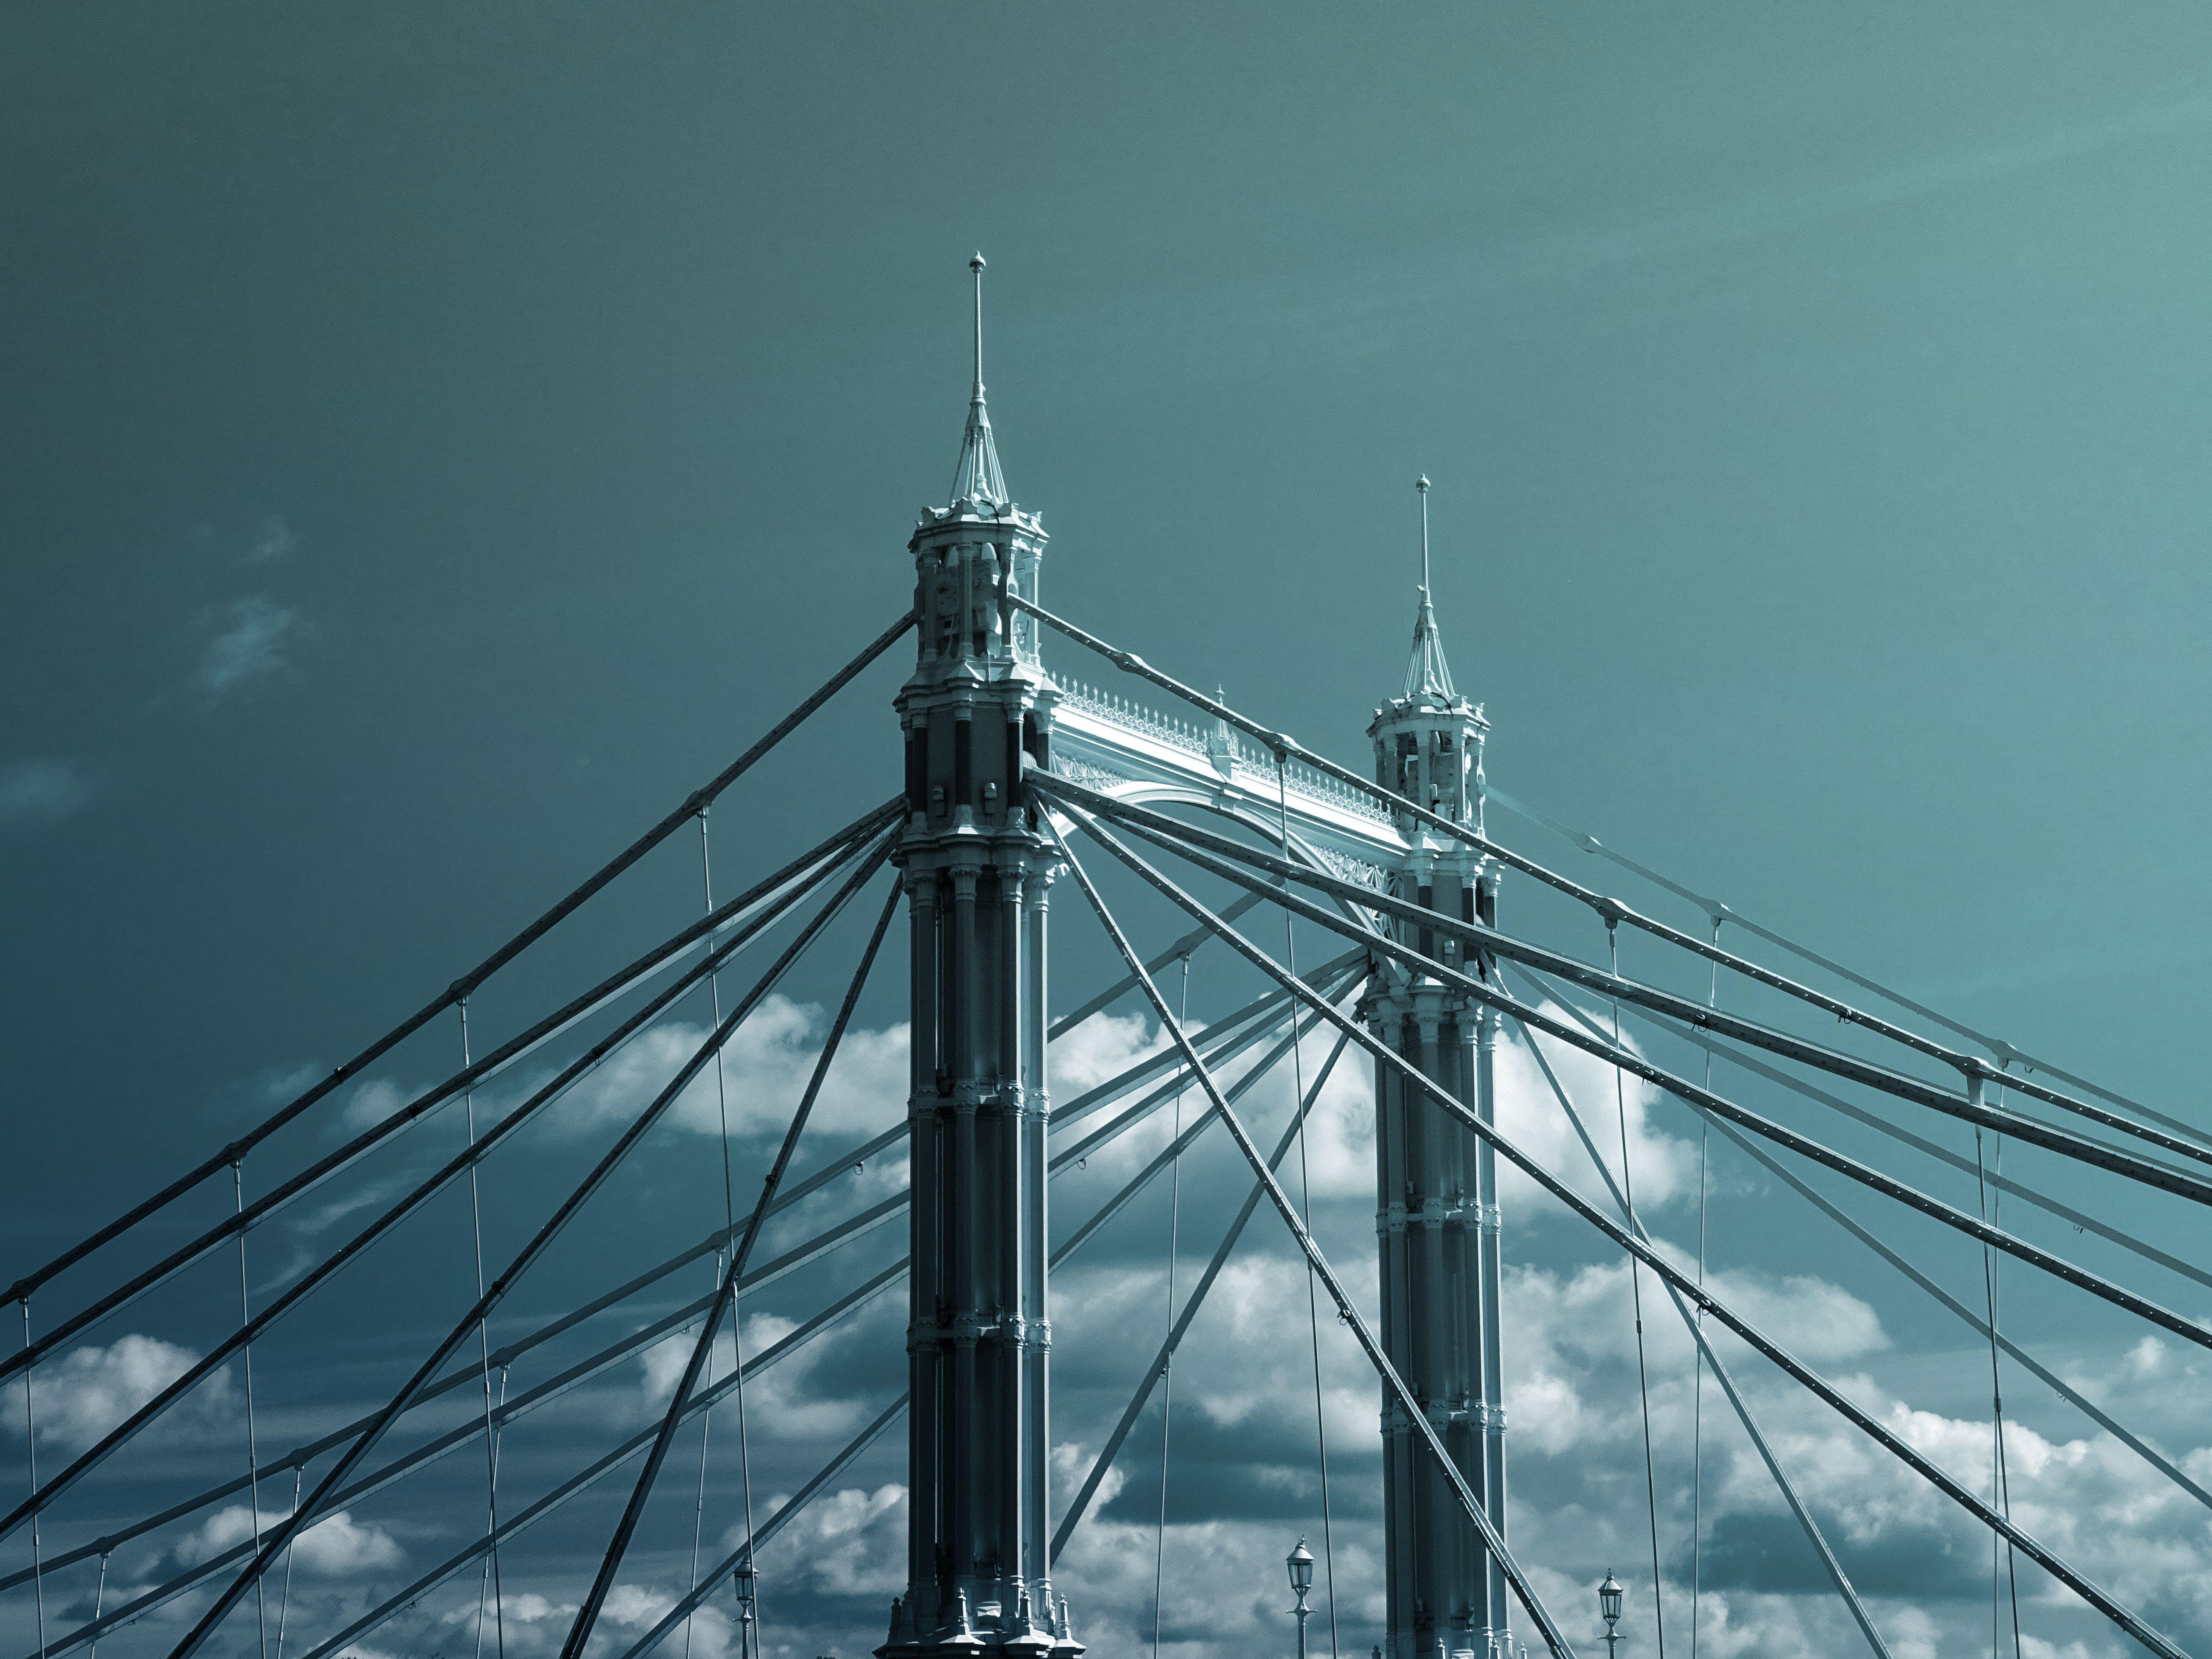 Gratis arkivbilde med arkitektur, bro, by, bygning